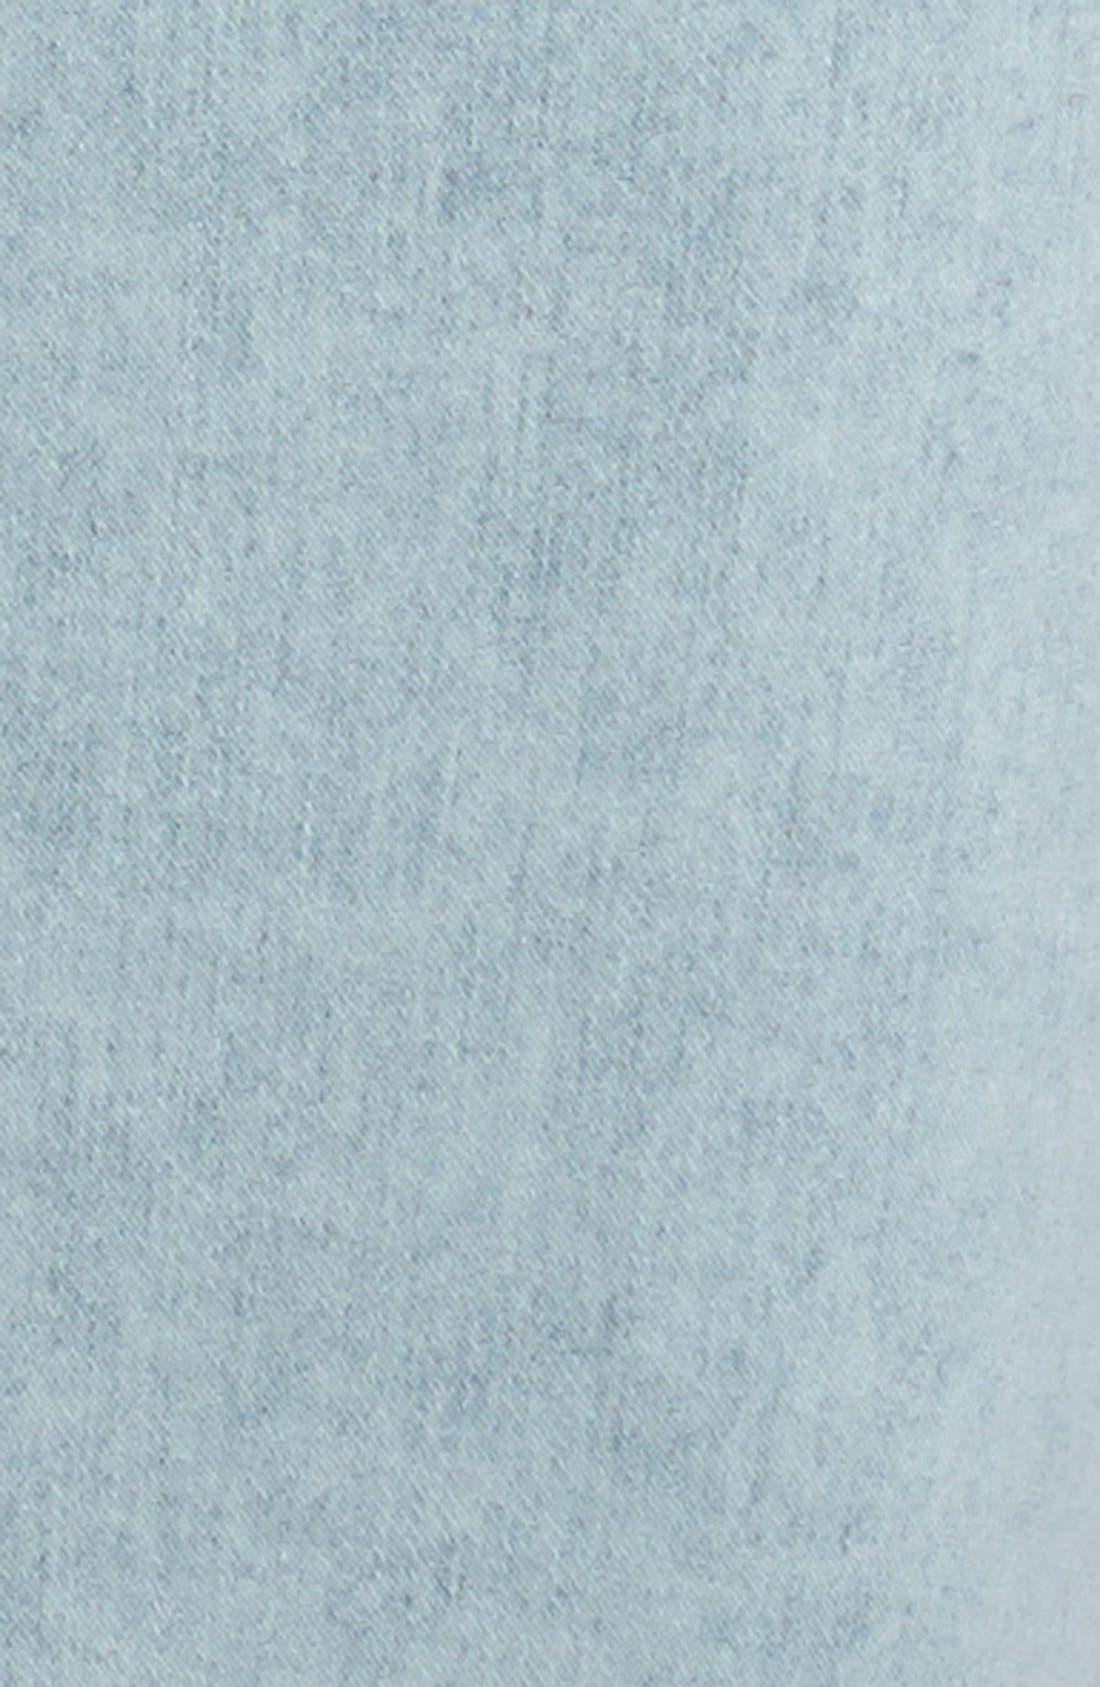 Alternate Image 3  - Topshop 'Joni' Acid Wash Denim Pencil Skirt